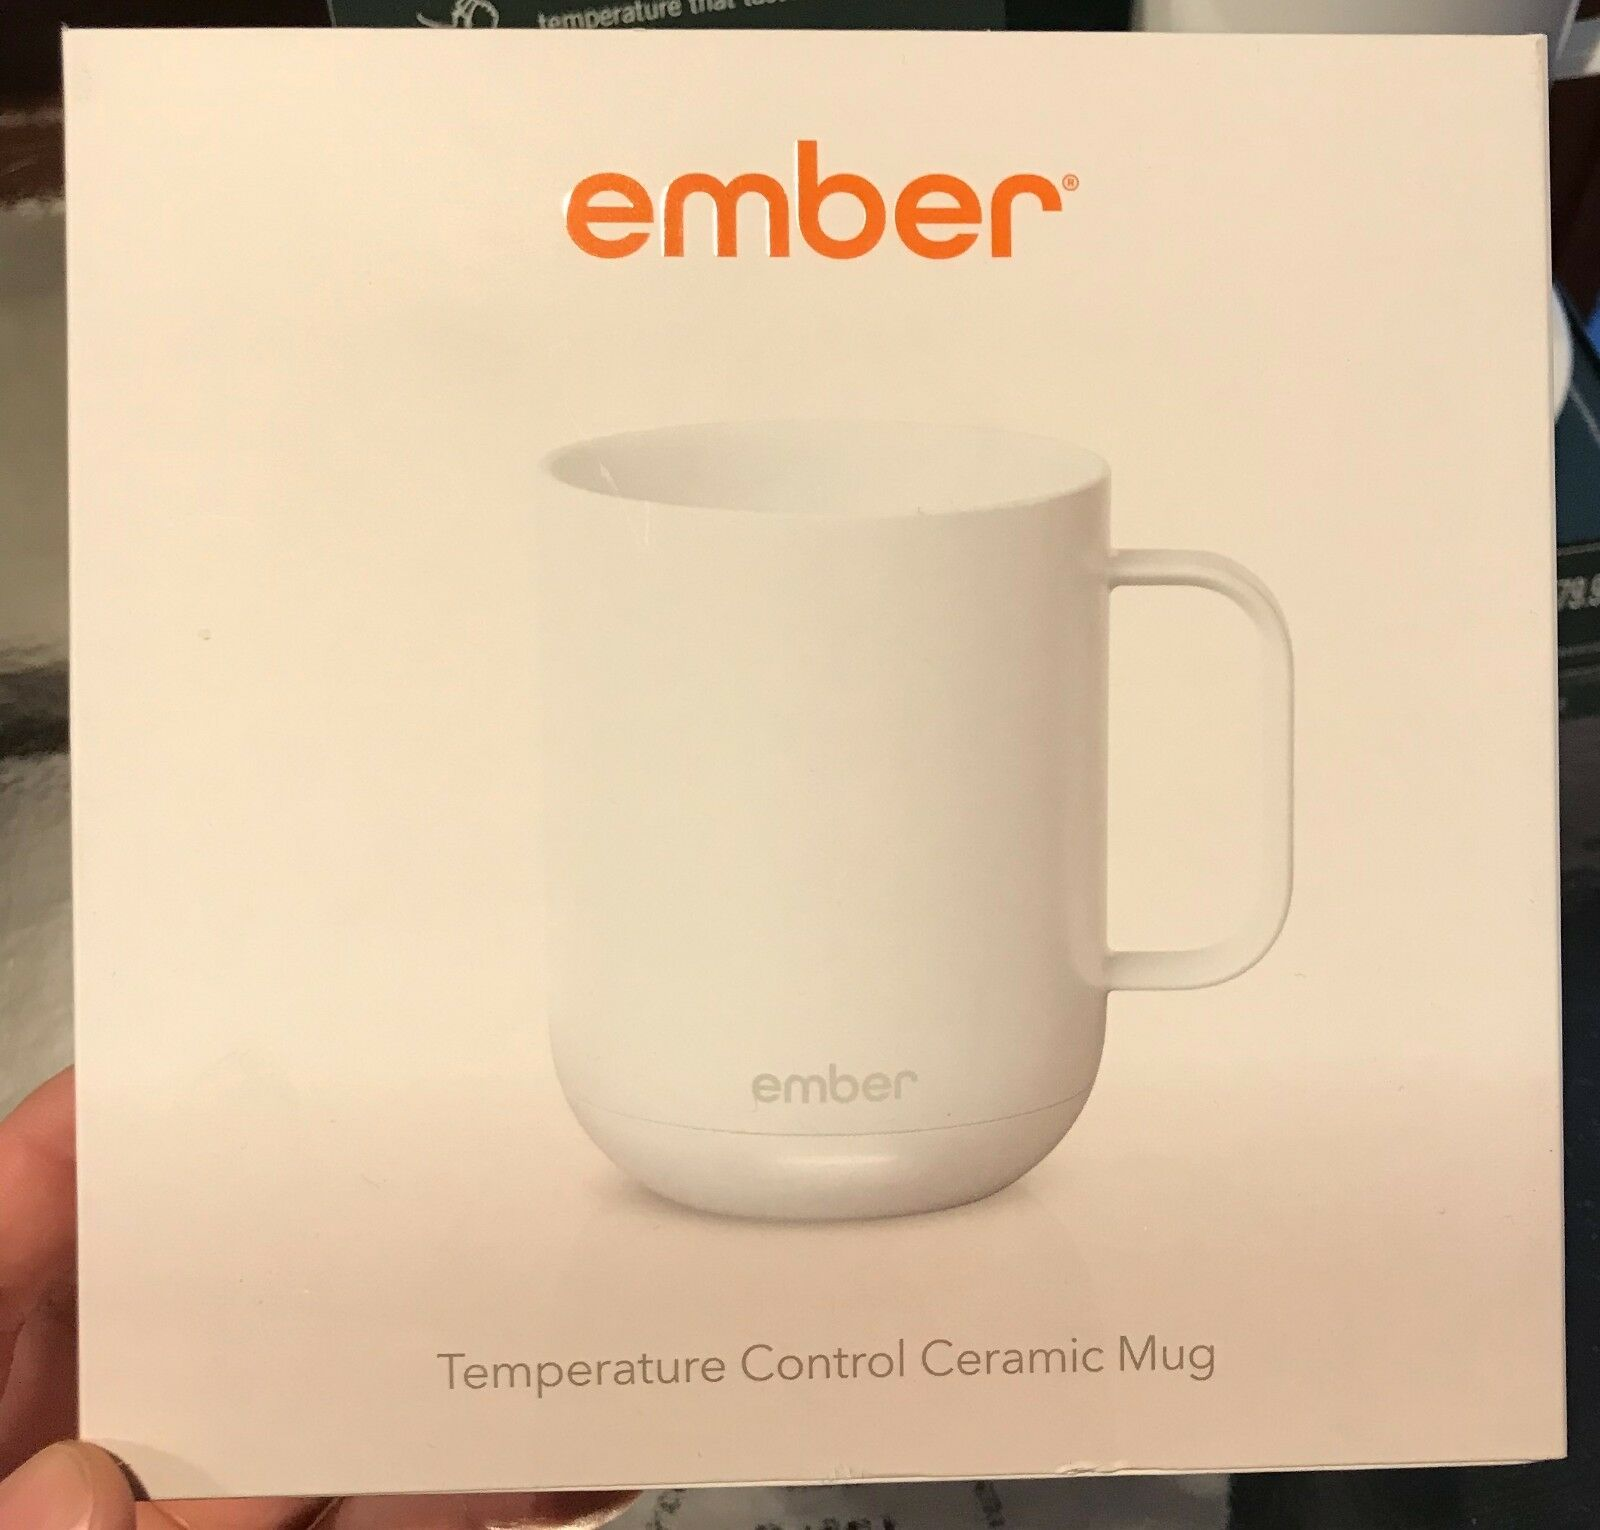 Ember Ceramic Mug Temperature Controlled - Fast Free Shipping